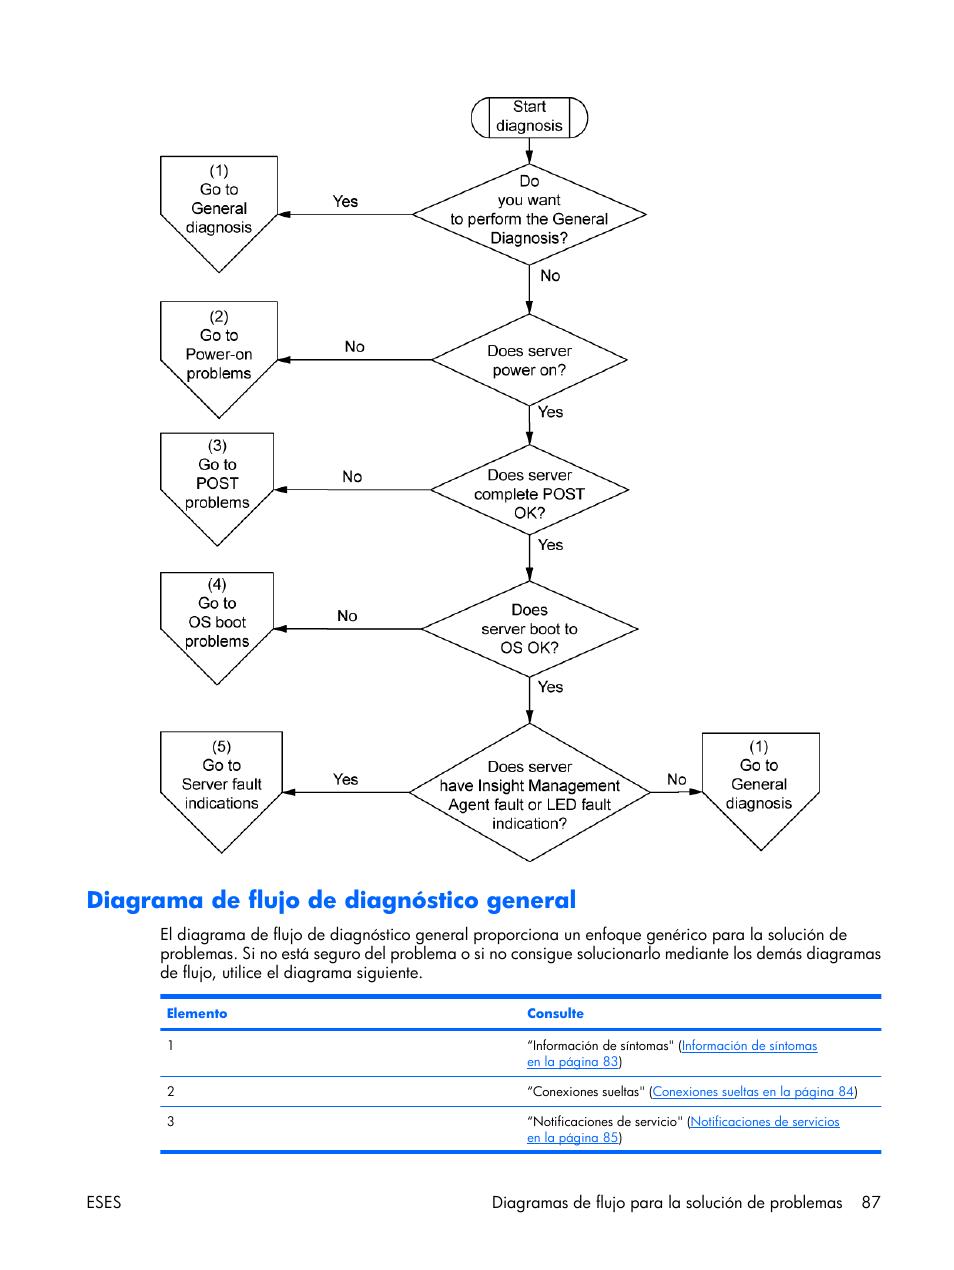 diagrama de flujo de diagn�stico general, o general, diagrama de flujo de  diagn�stico   hp servidor hp proliant dl380 g5 user manual   page 95 / 137